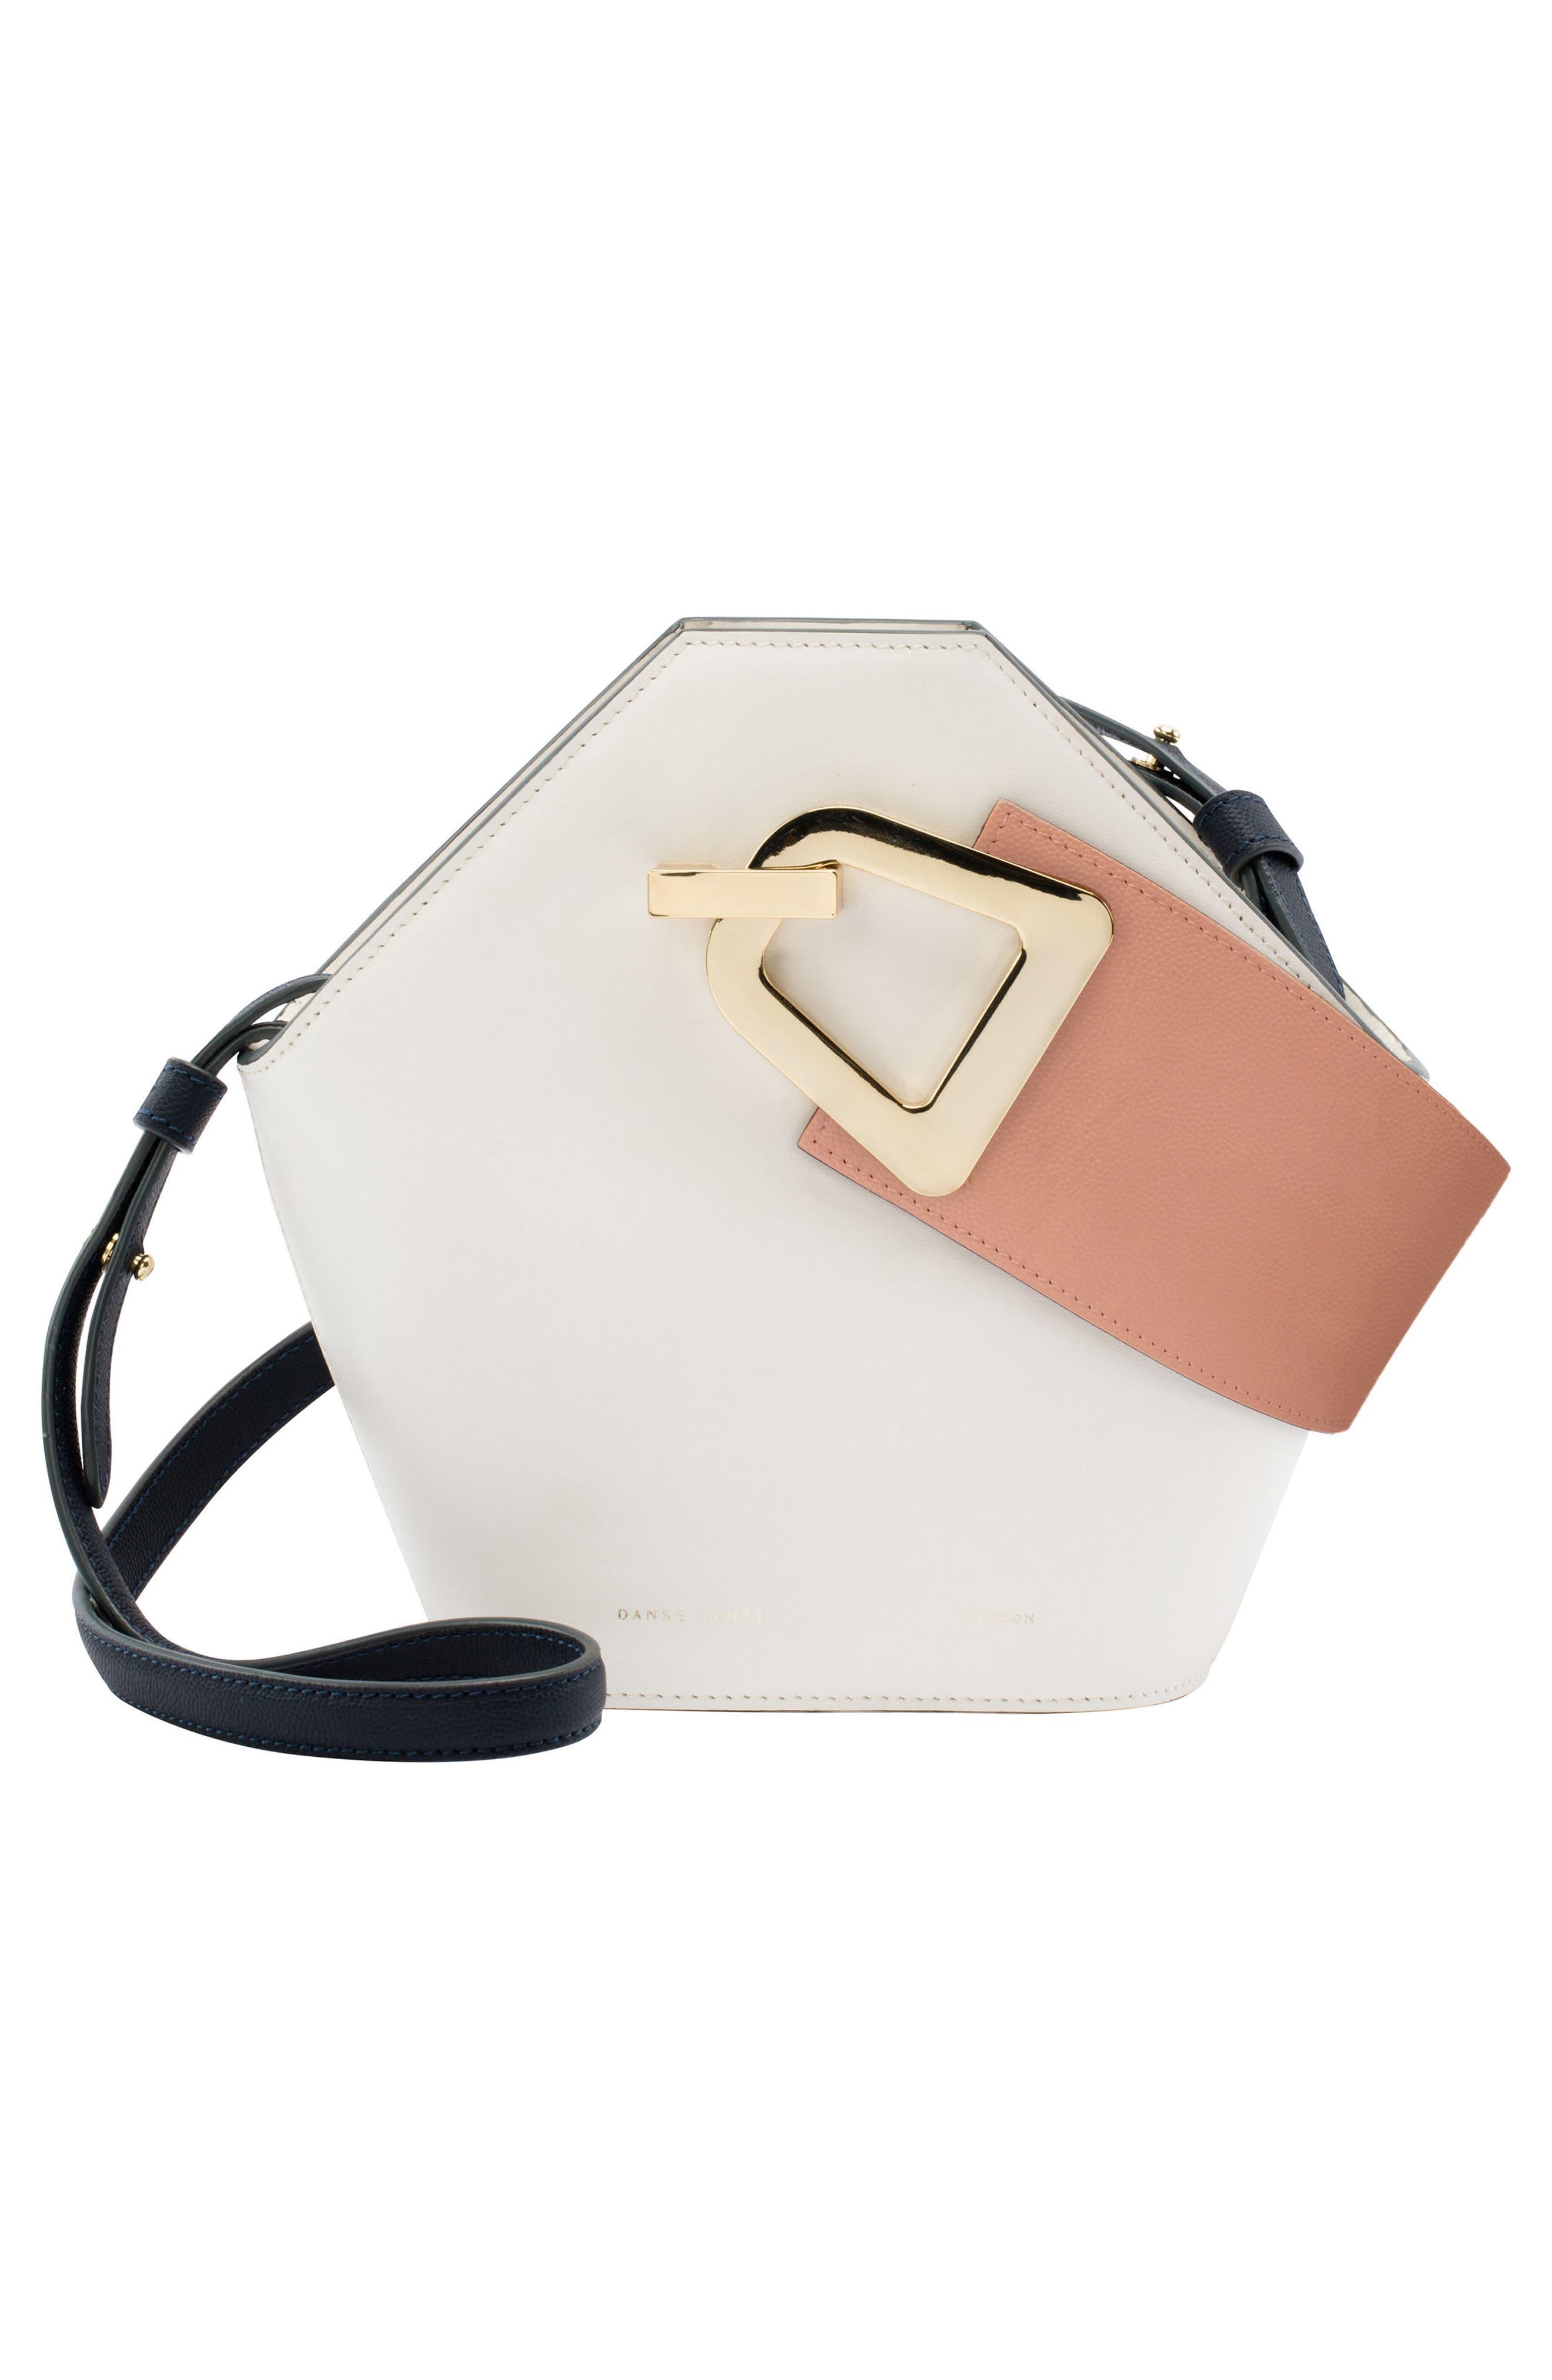 Mini Johnny Leather Bucket Bag,                             Alternate thumbnail 2, color,                             101